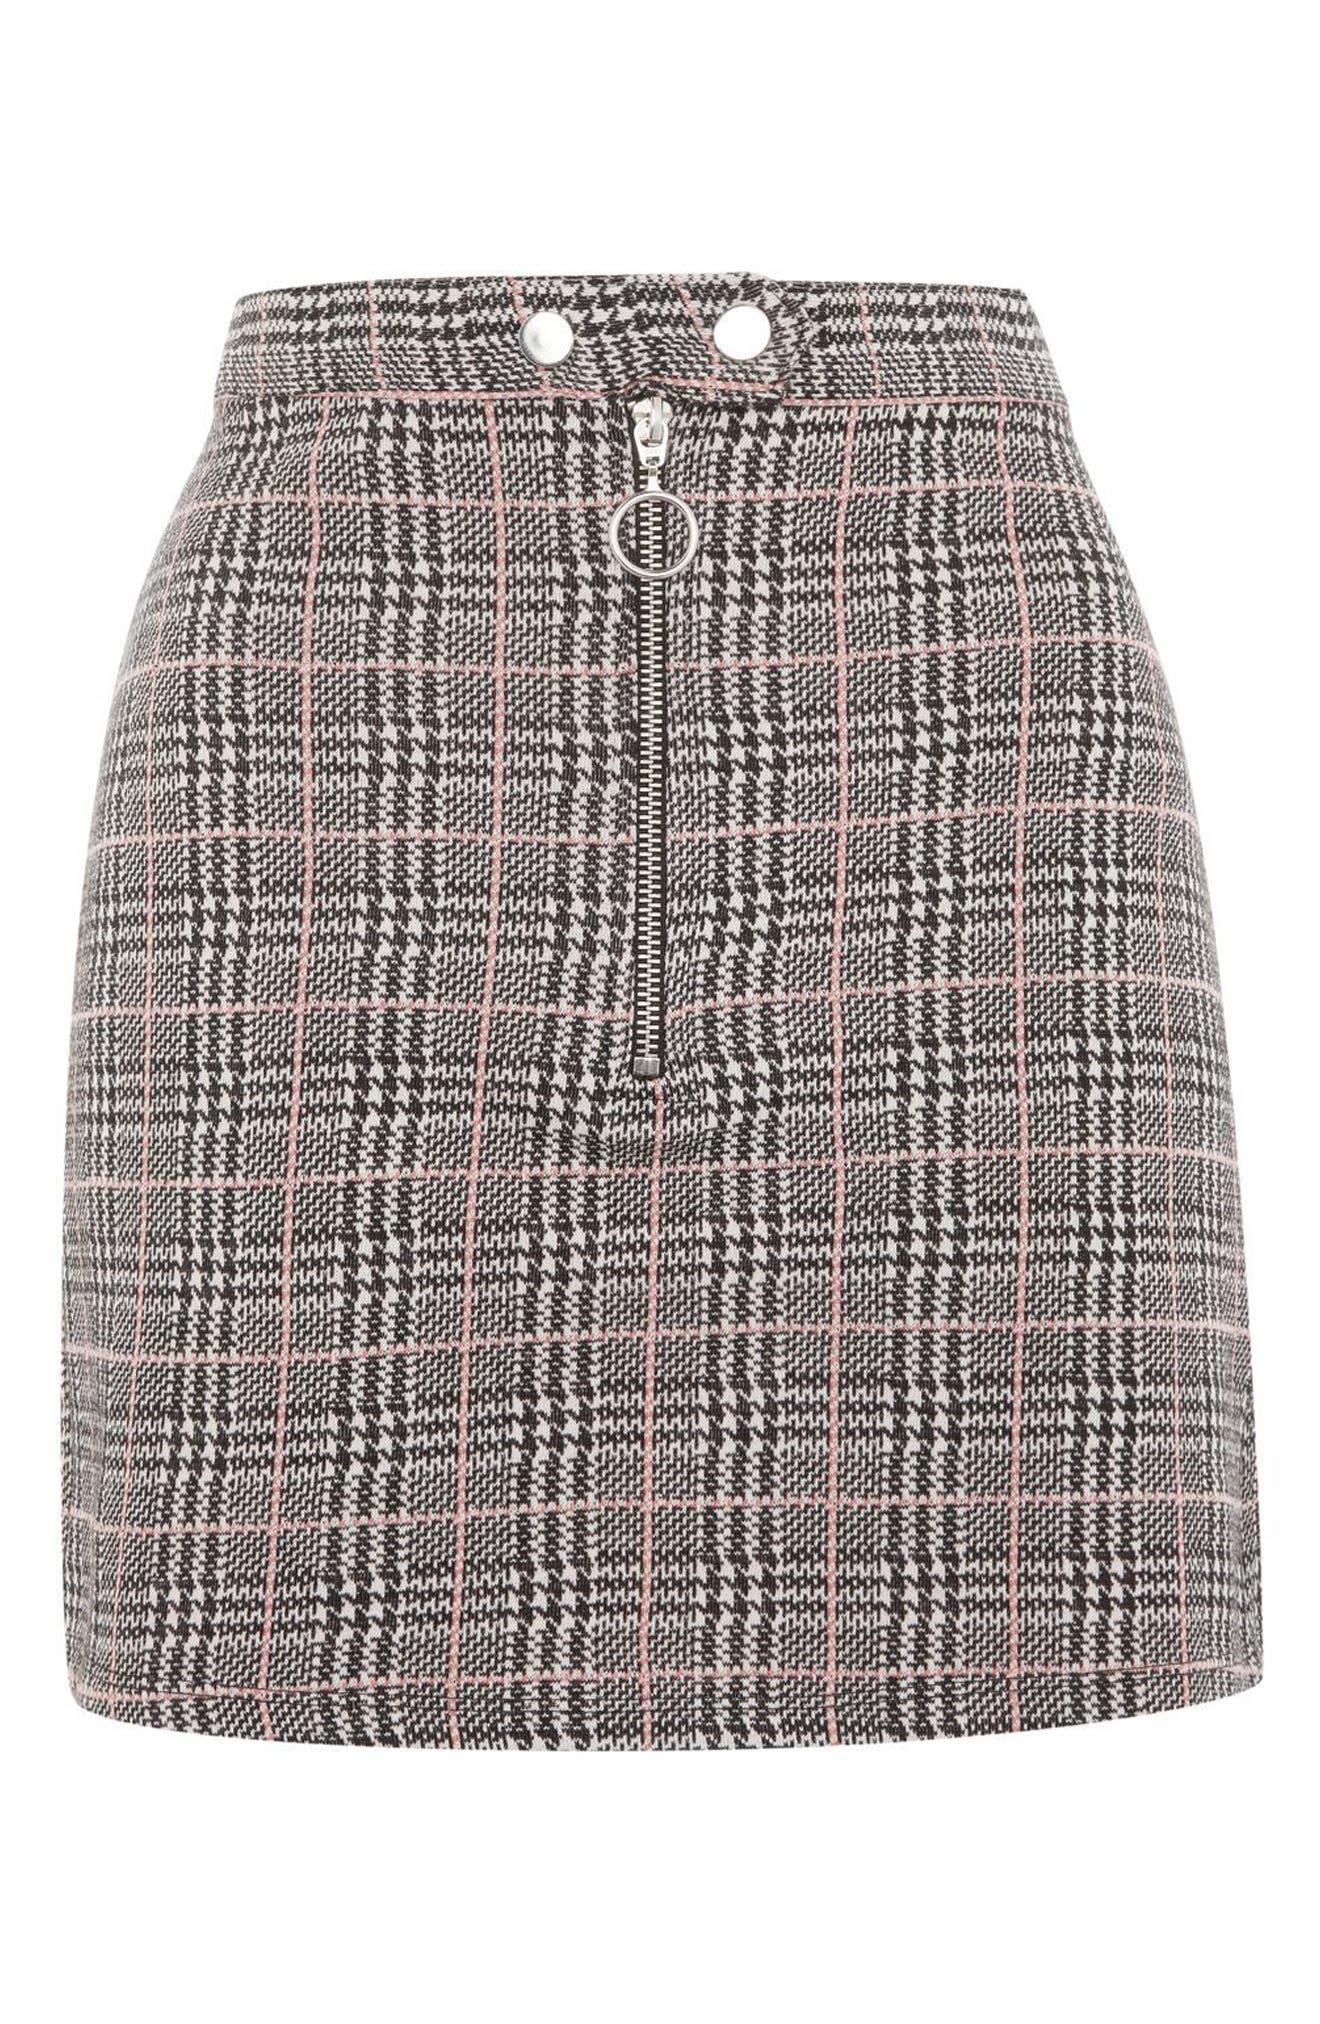 Zip Check Mini Skirt,                             Alternate thumbnail 3, color,                             020